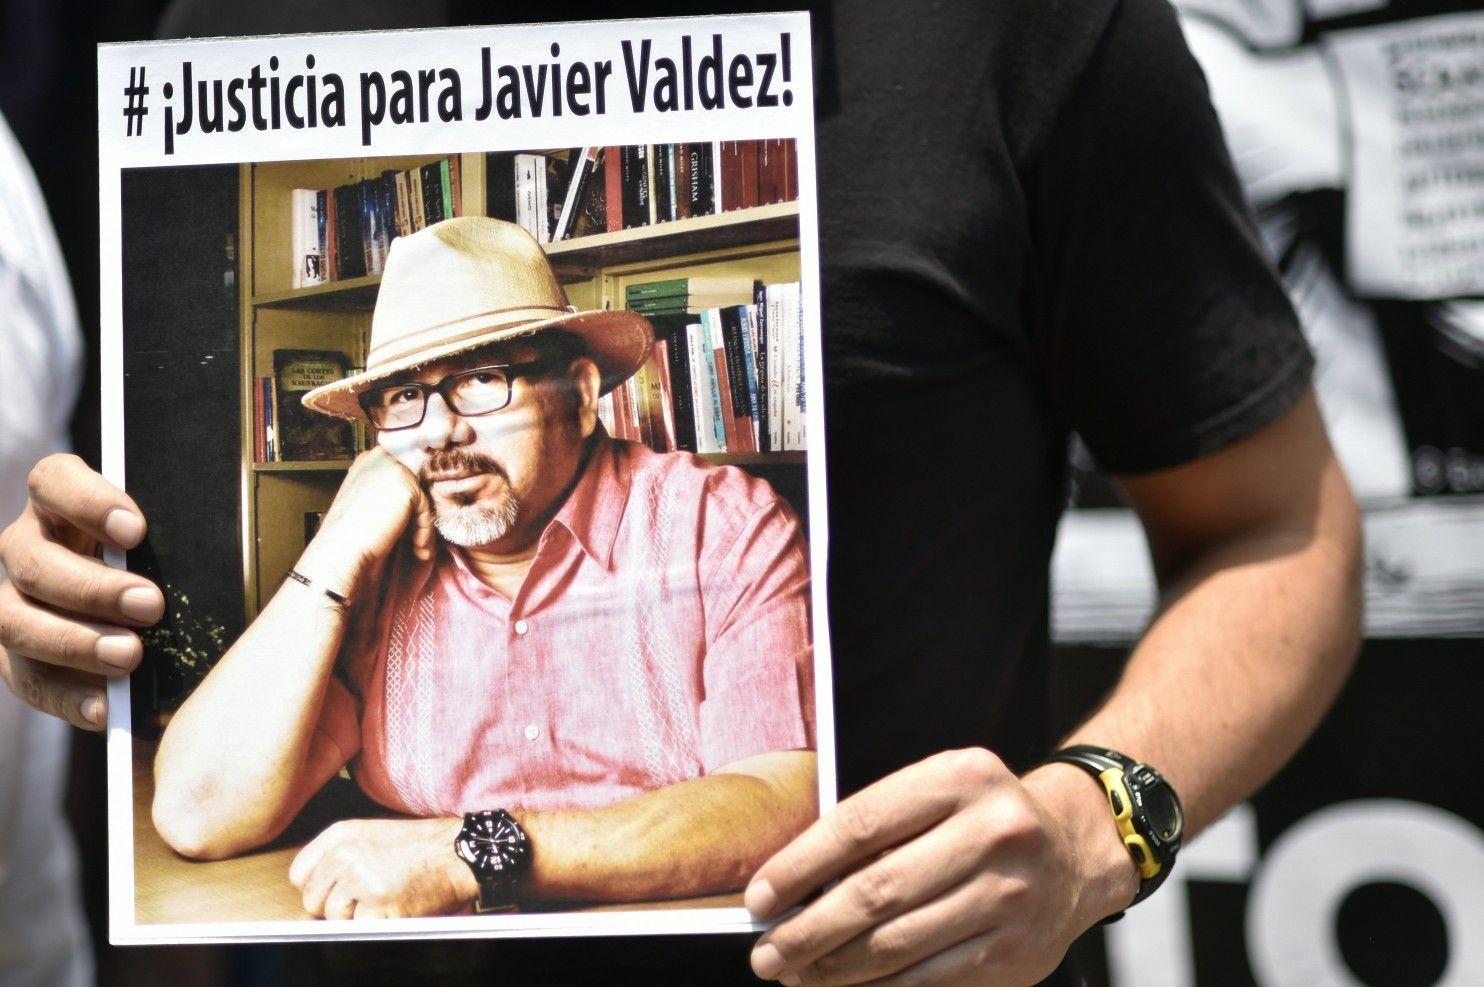 Periodista Javier Valdéz fue asesinado por dos atacantes: Procuraduría de México